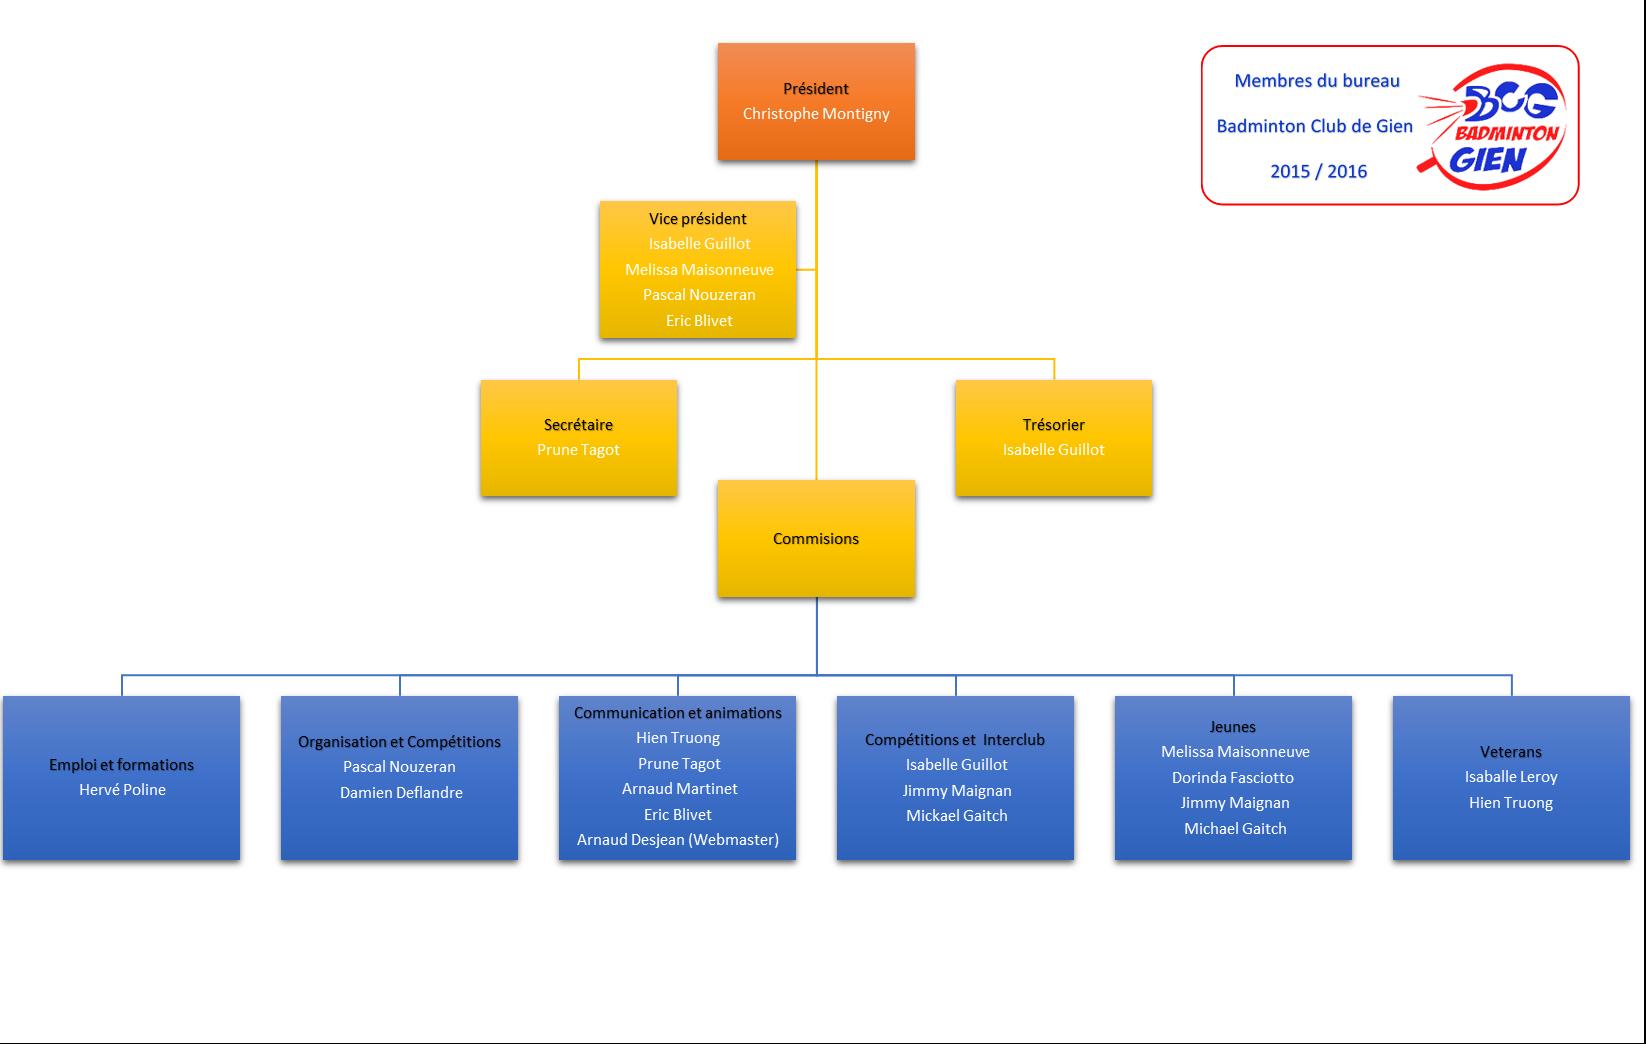 Organigramme Membres du bureau 2015_2016